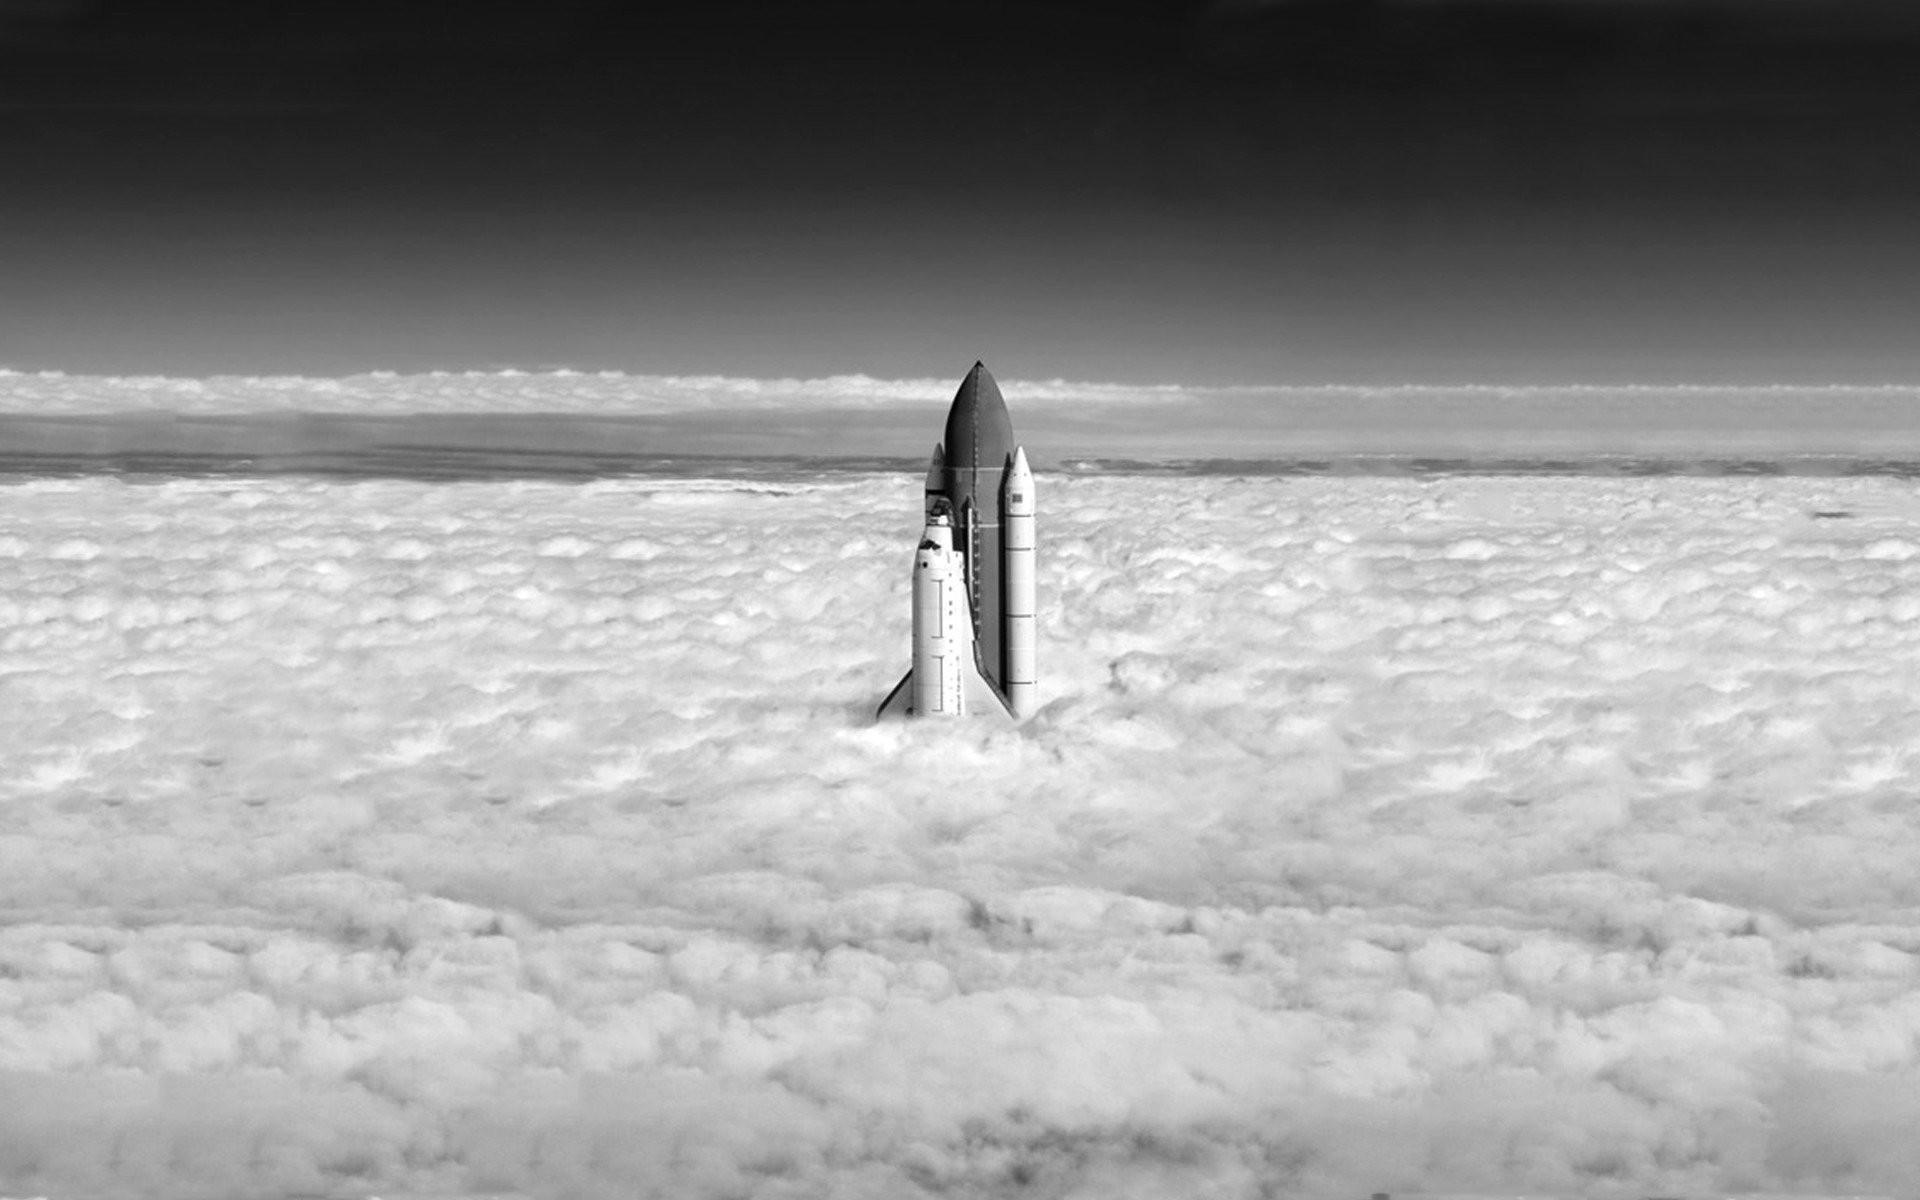 Res: 1920x1200, nasa skies planes universe astronauts earth futuristic